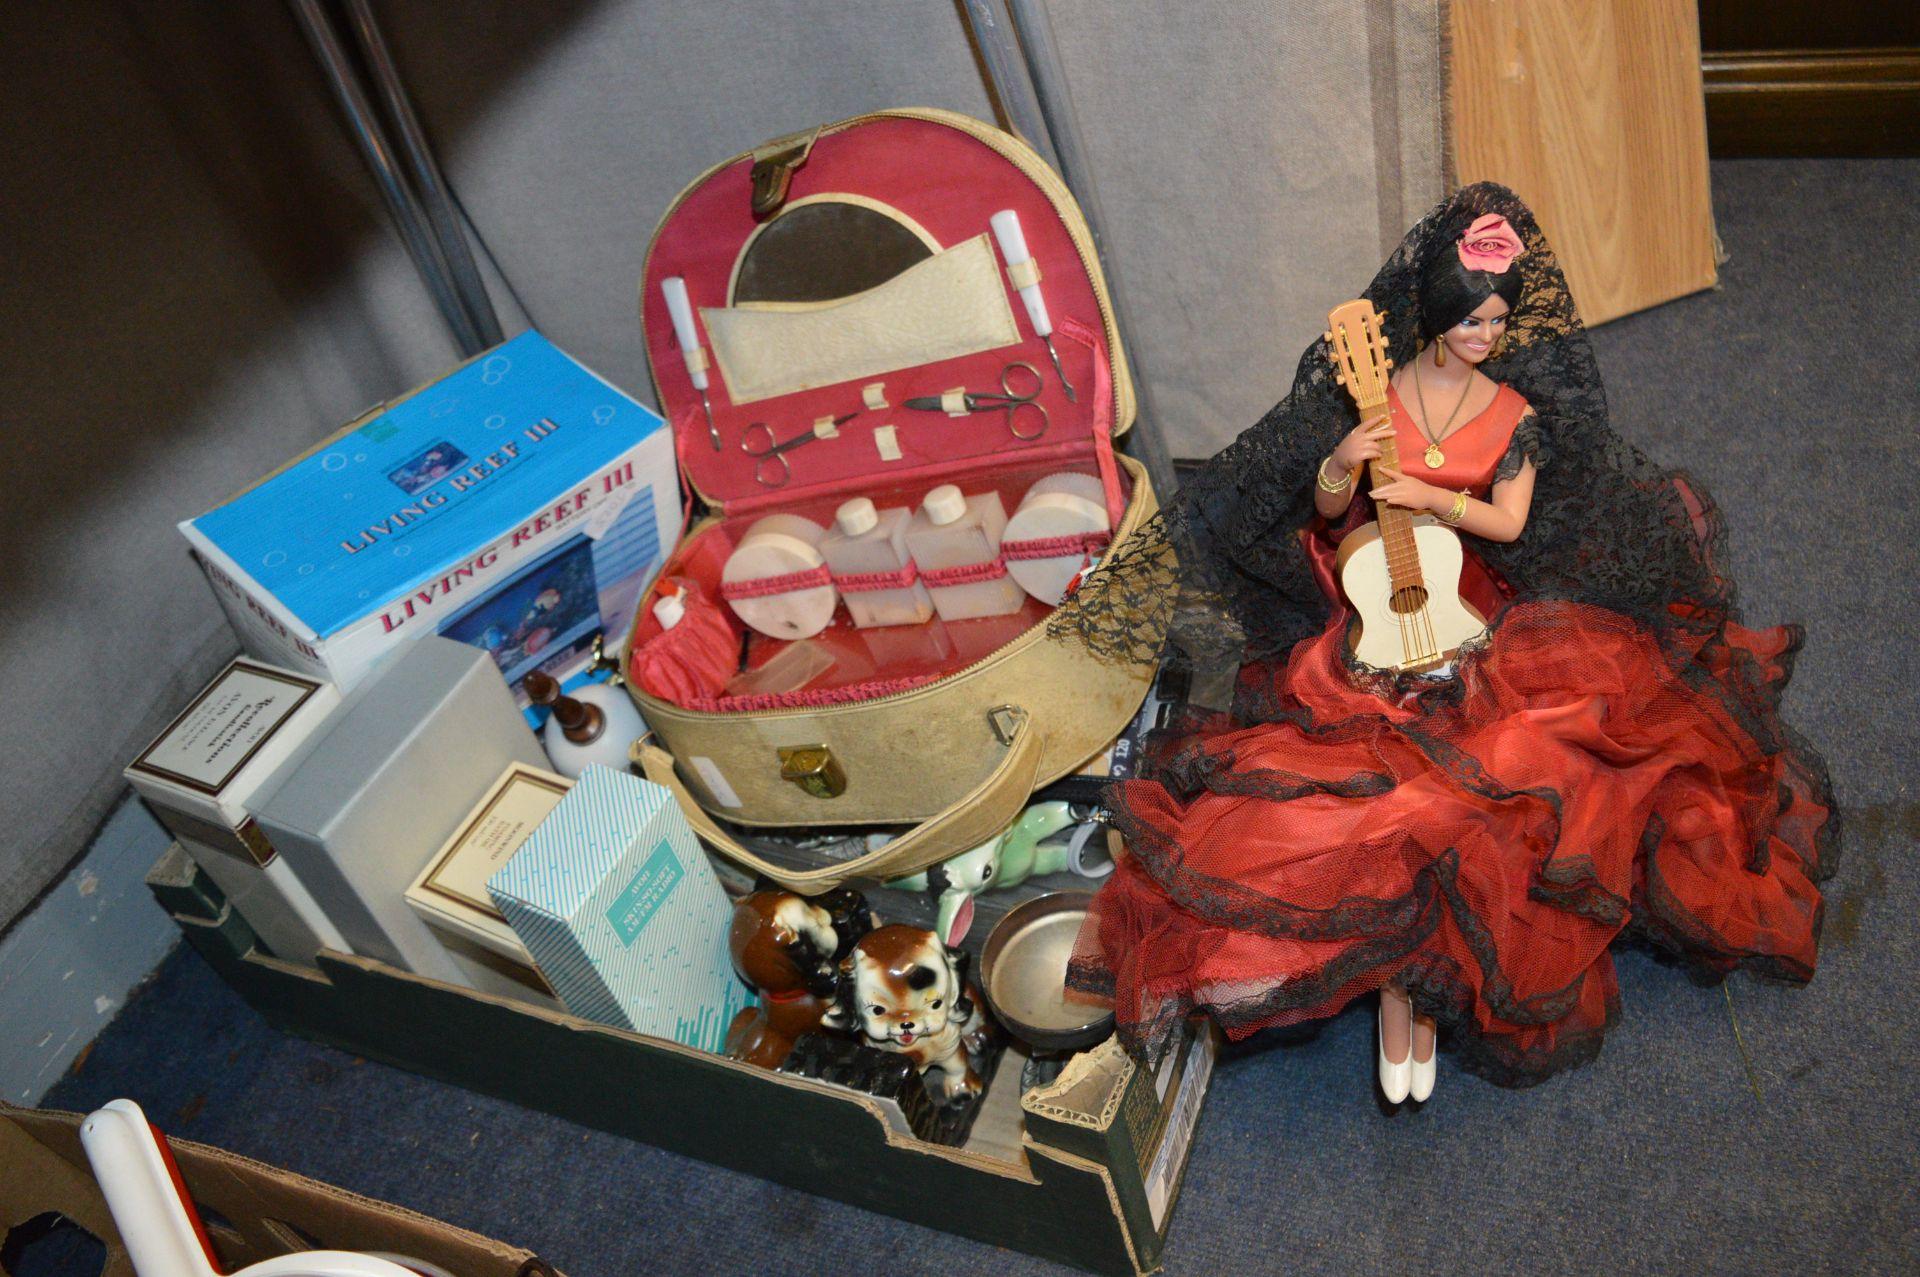 Lot 628 - Box of Assorted Retro Items Including a Spanish La